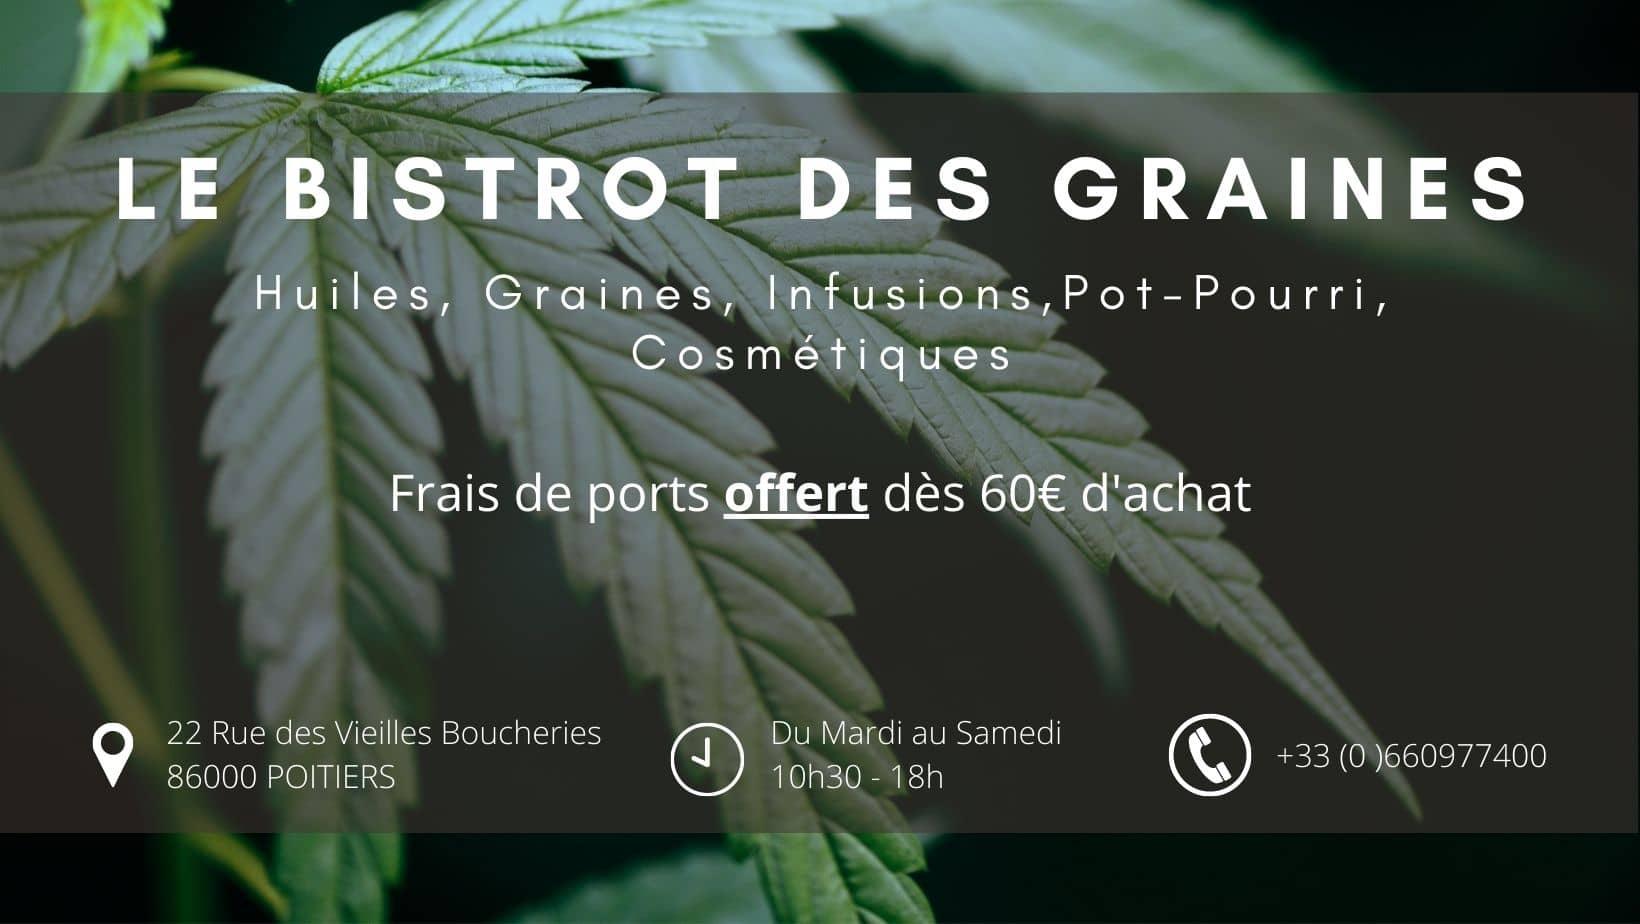 Bistrot des graines Poitiers